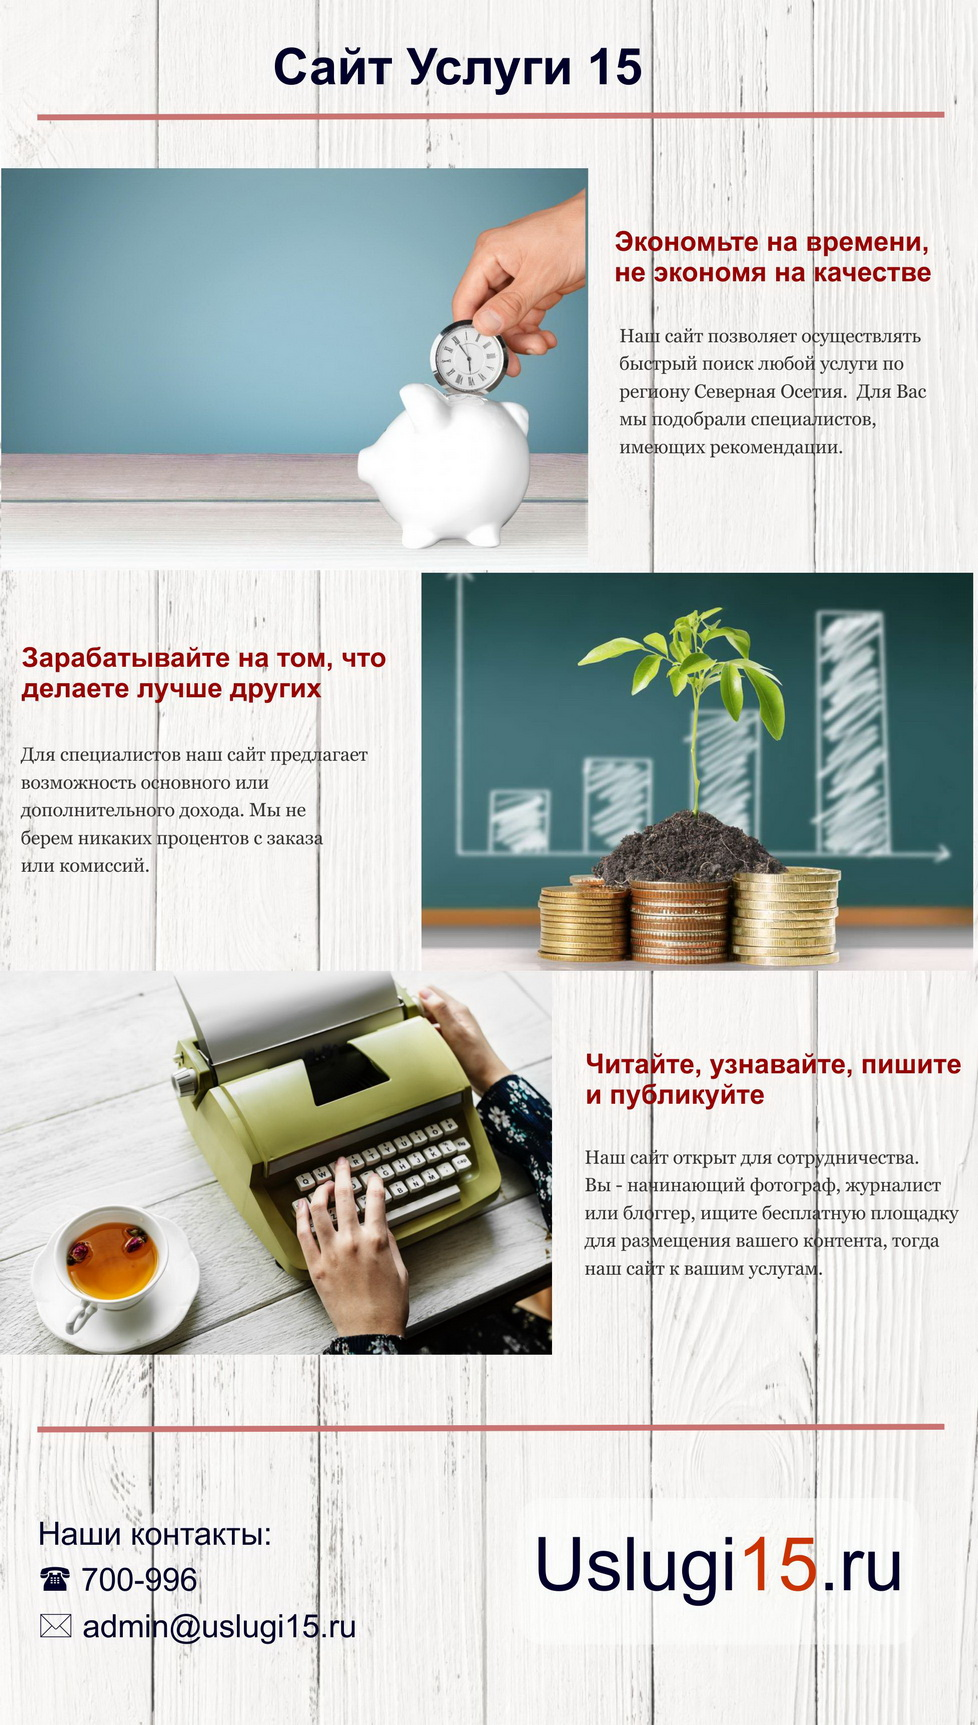 cccab5bda253c Заходите, пожалуйста, на наш сайт uslugi15.ru